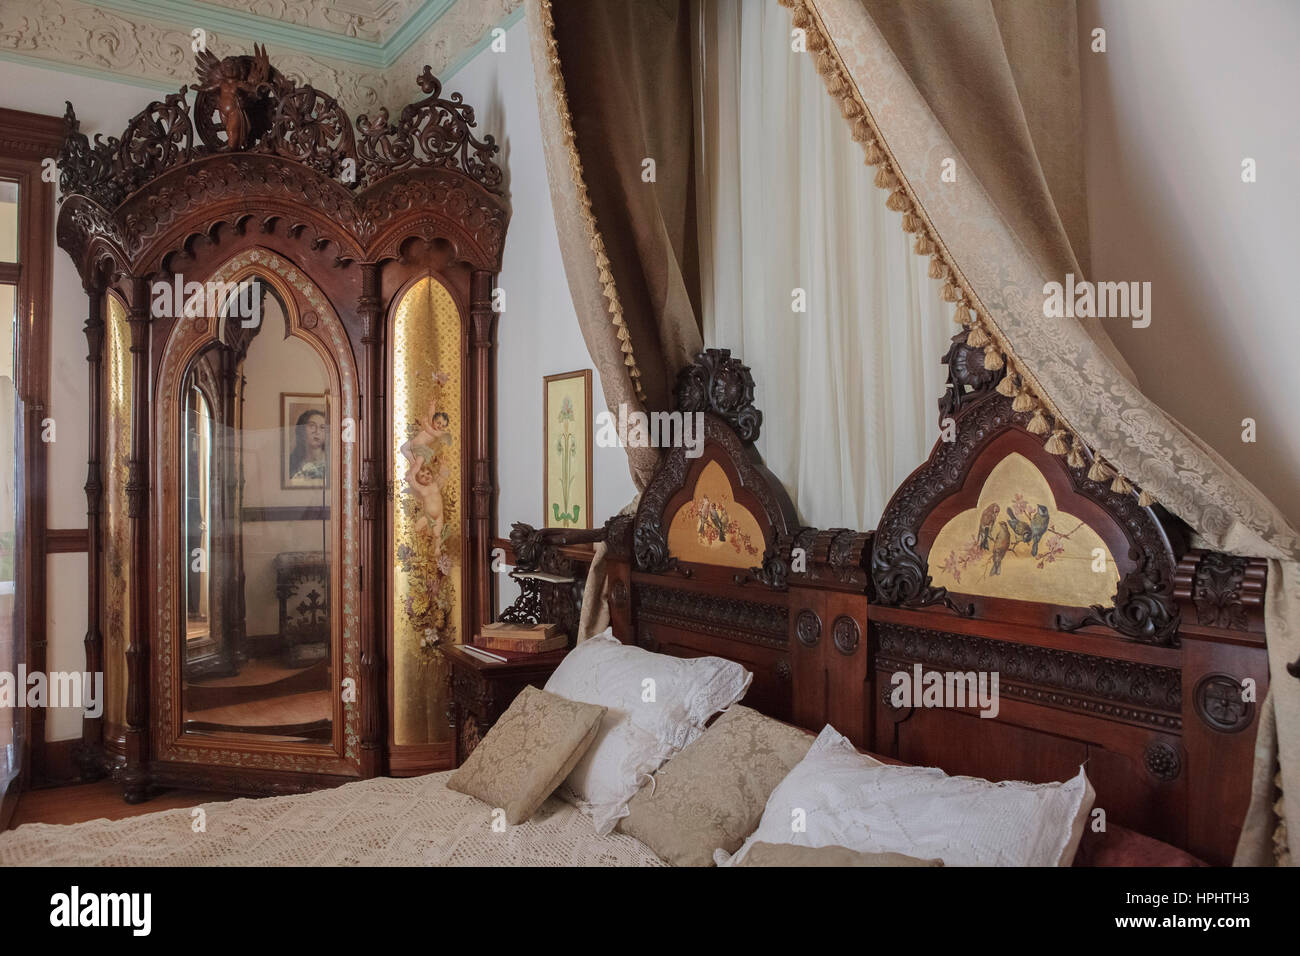 furniture in mexico. Mexico, Chihuahua State, Chuihuahua, Gameros Villa, Quinta Gameros, Interior, Art Nouveau Furniture, Parents Bedroom Furniture In Mexico E